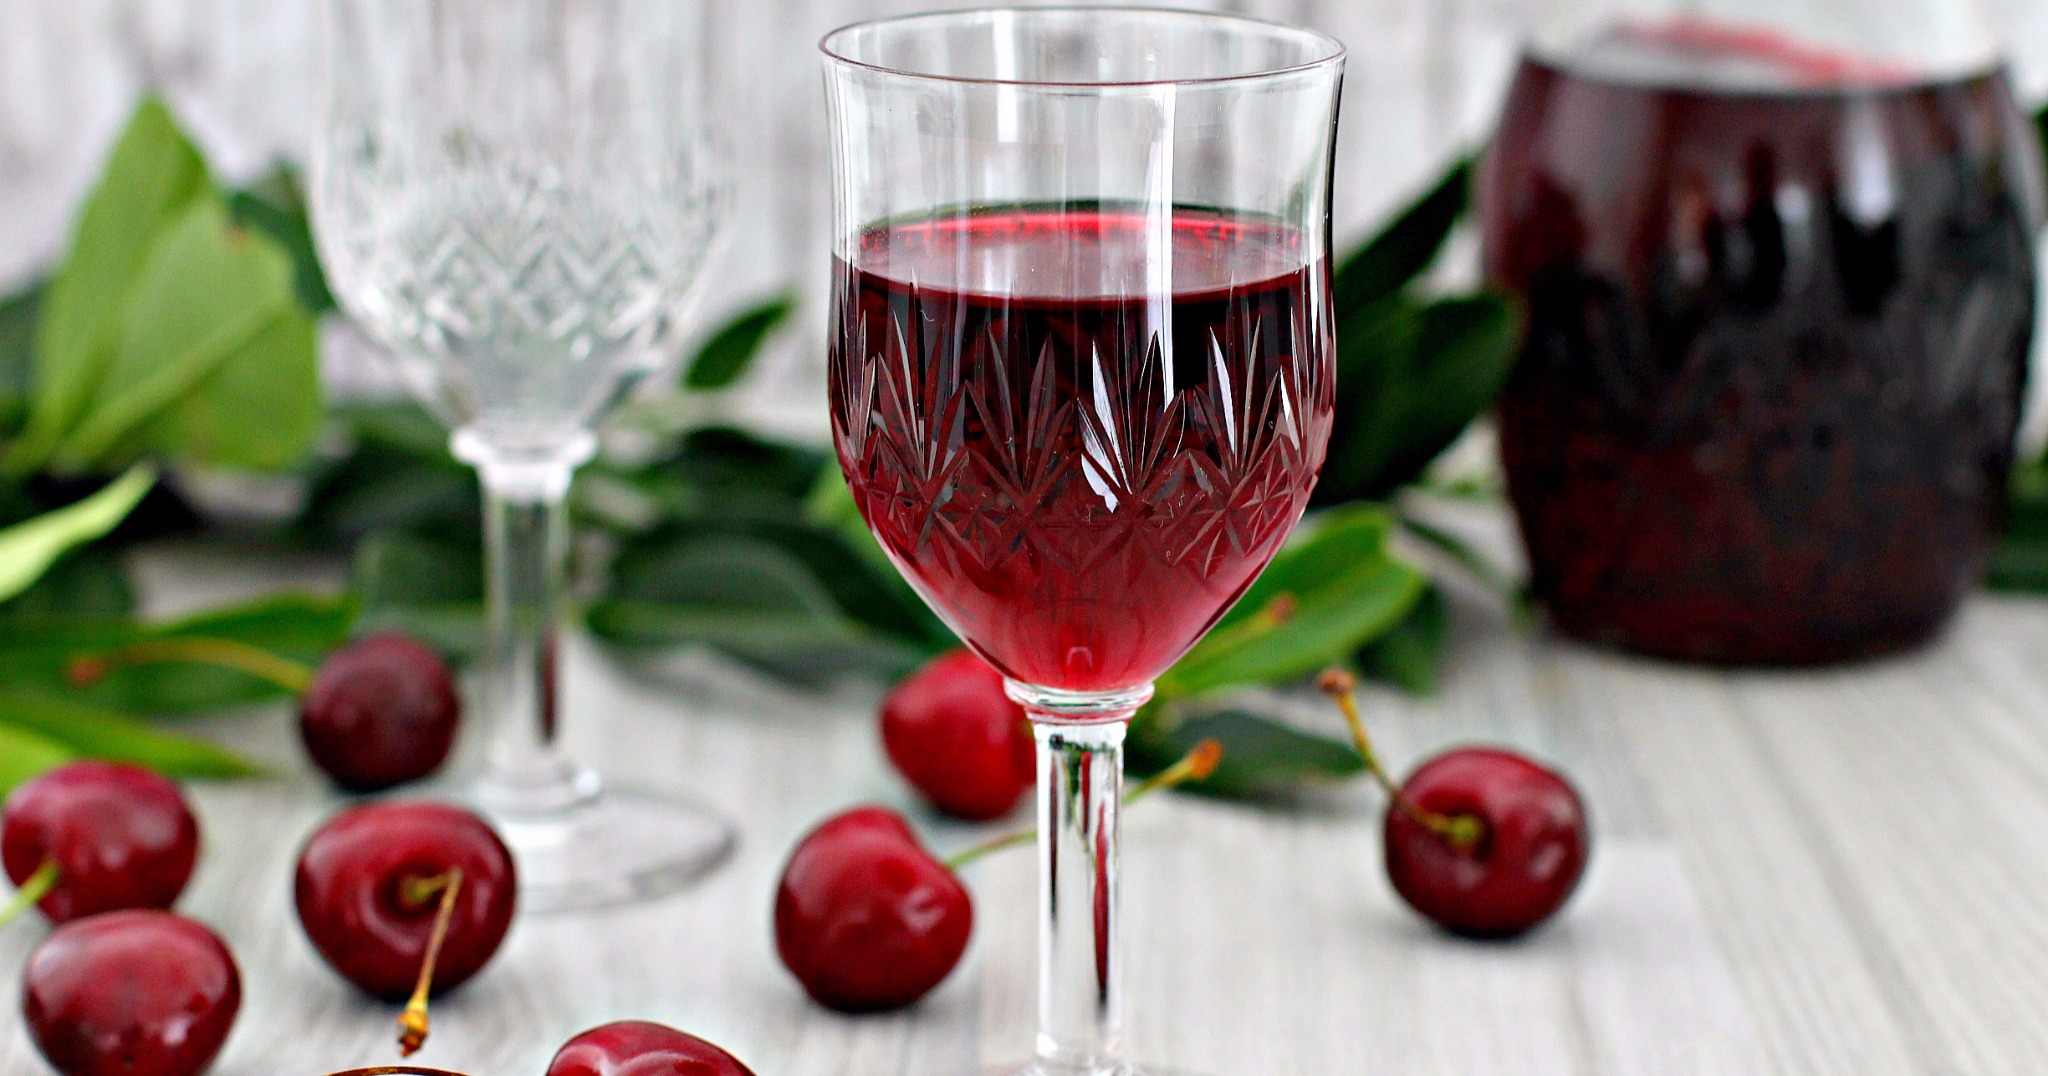 Рецепт настойка из вишни на водке в домашних условиях